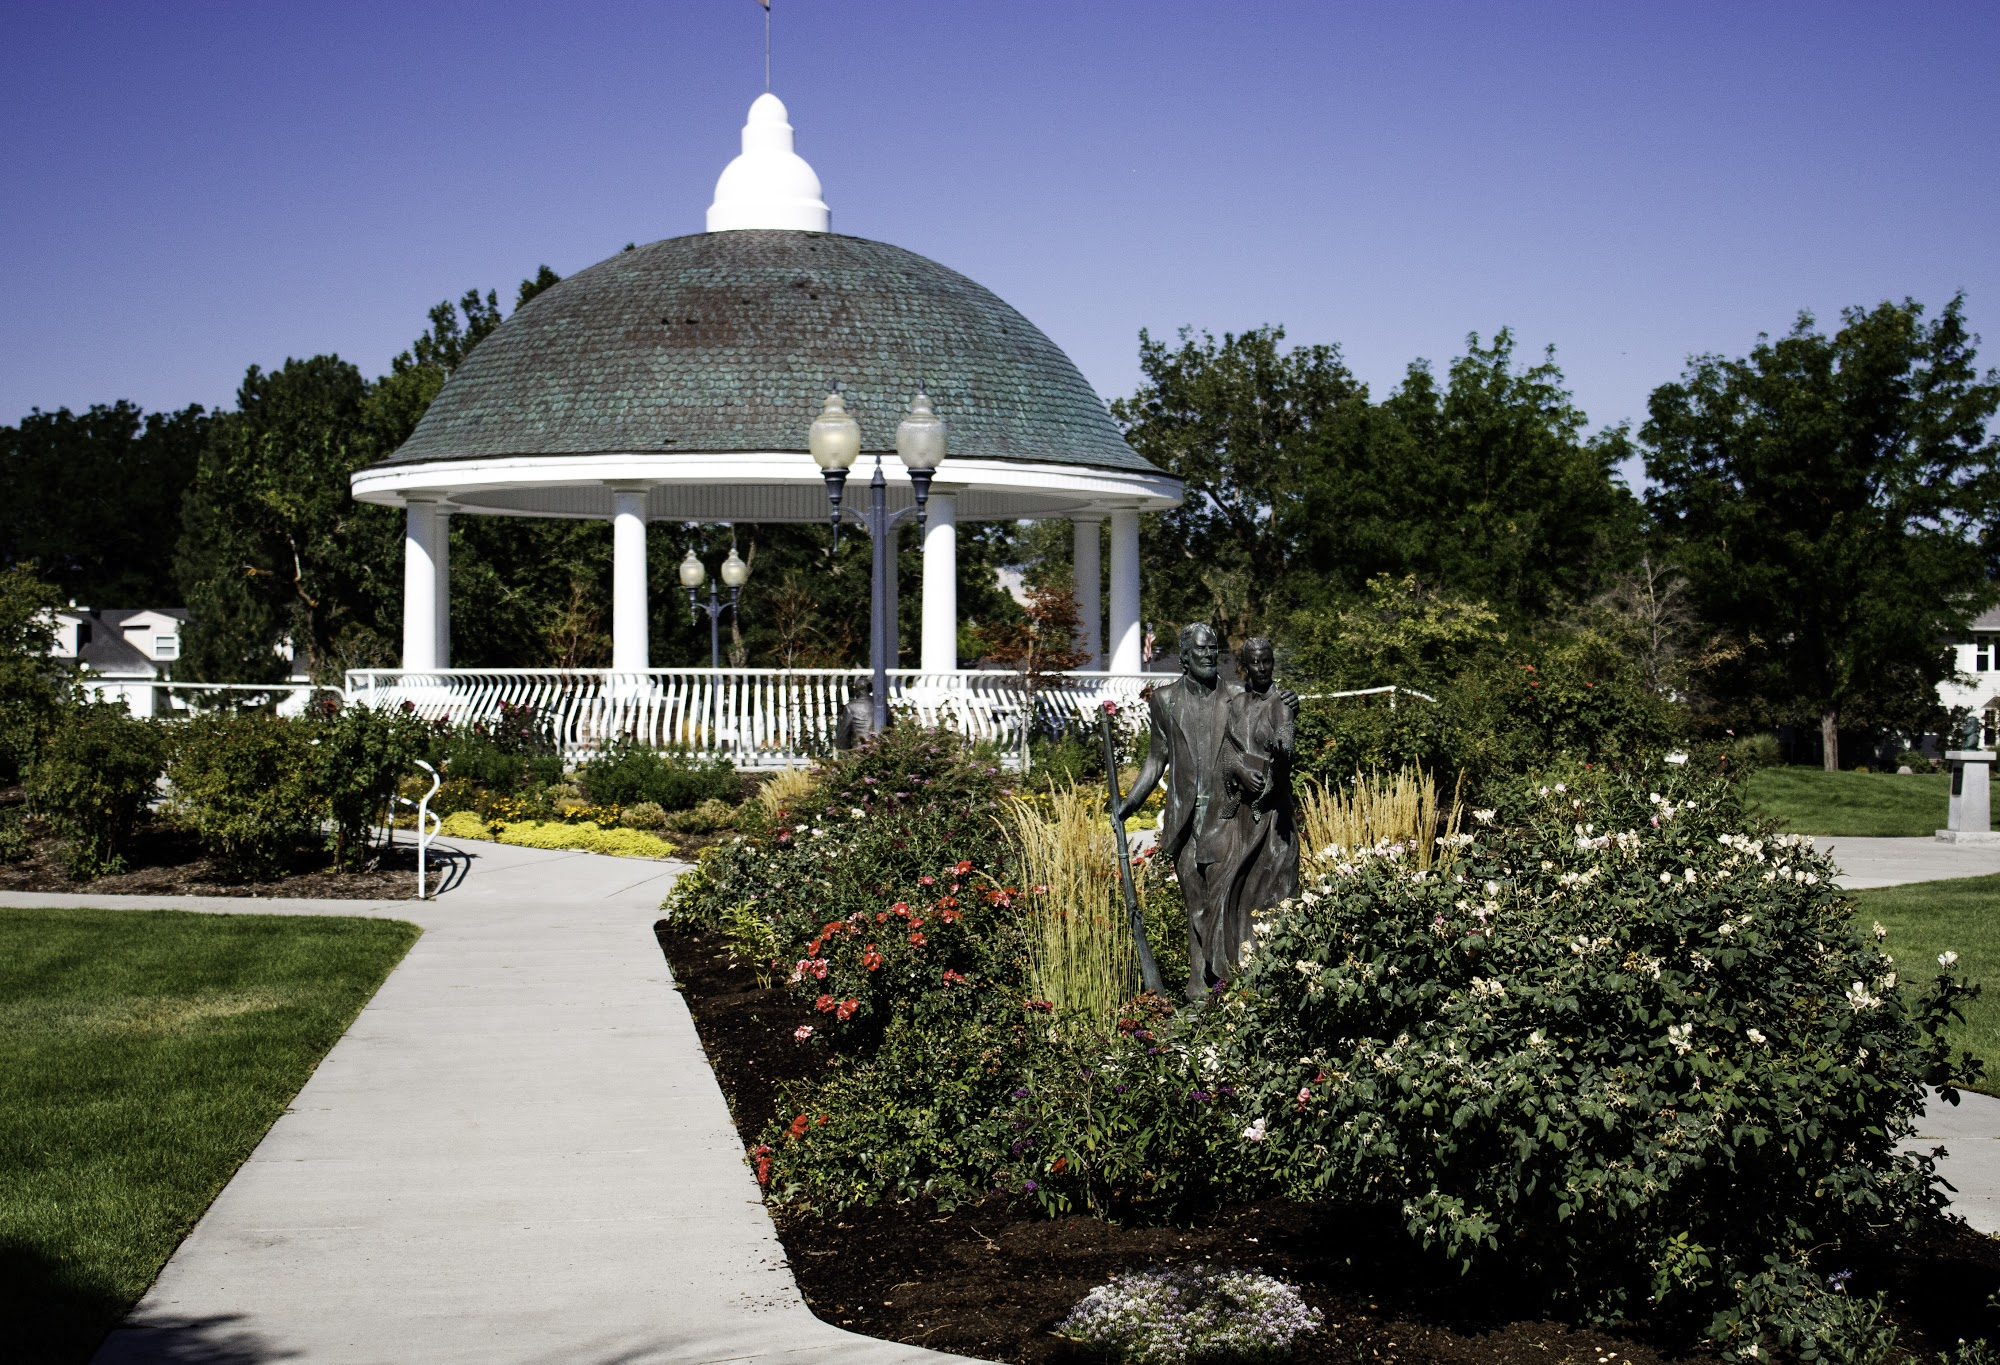 Draper Historic Park 12625 900 E, Draper